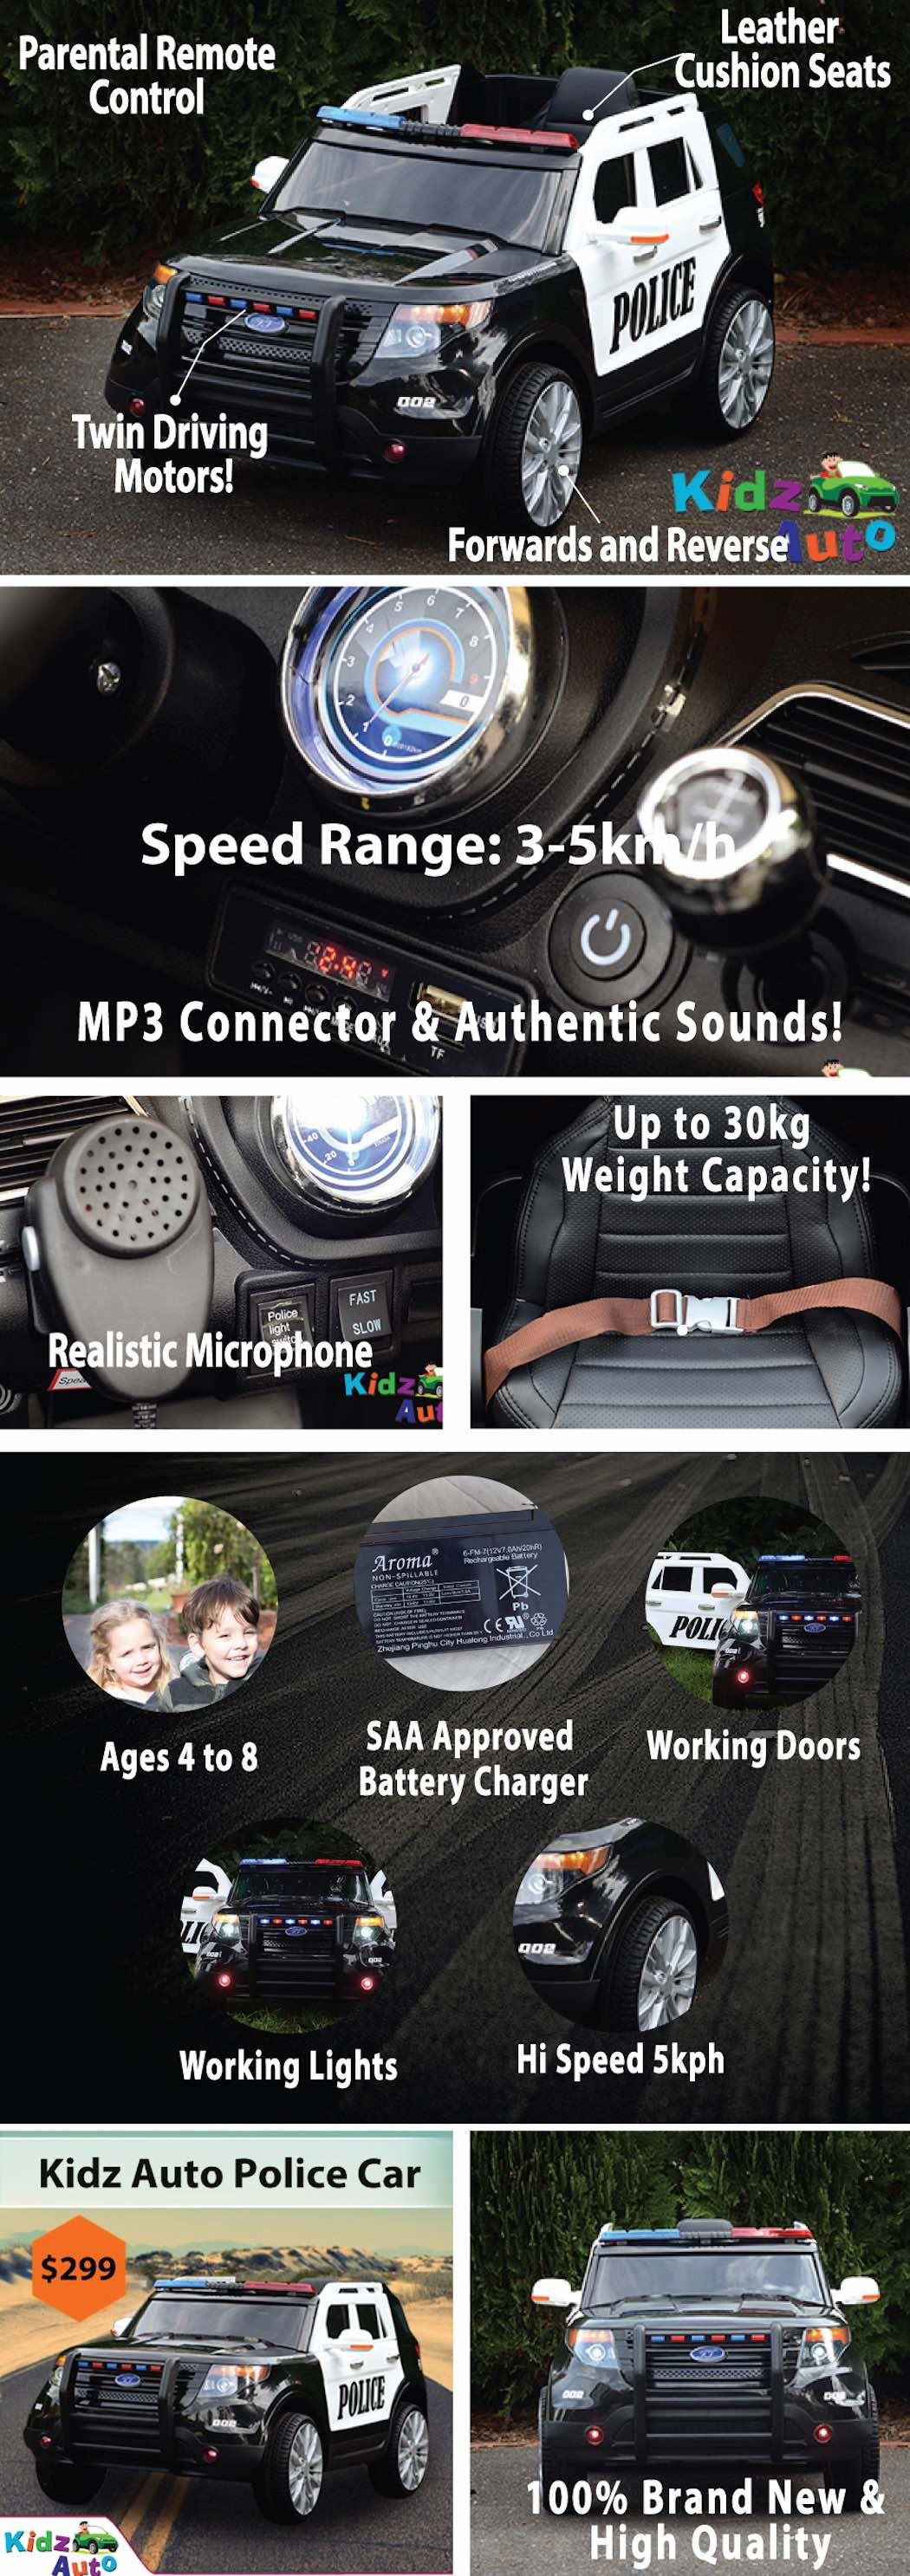 Kidz Auto Police Car - Product Specs